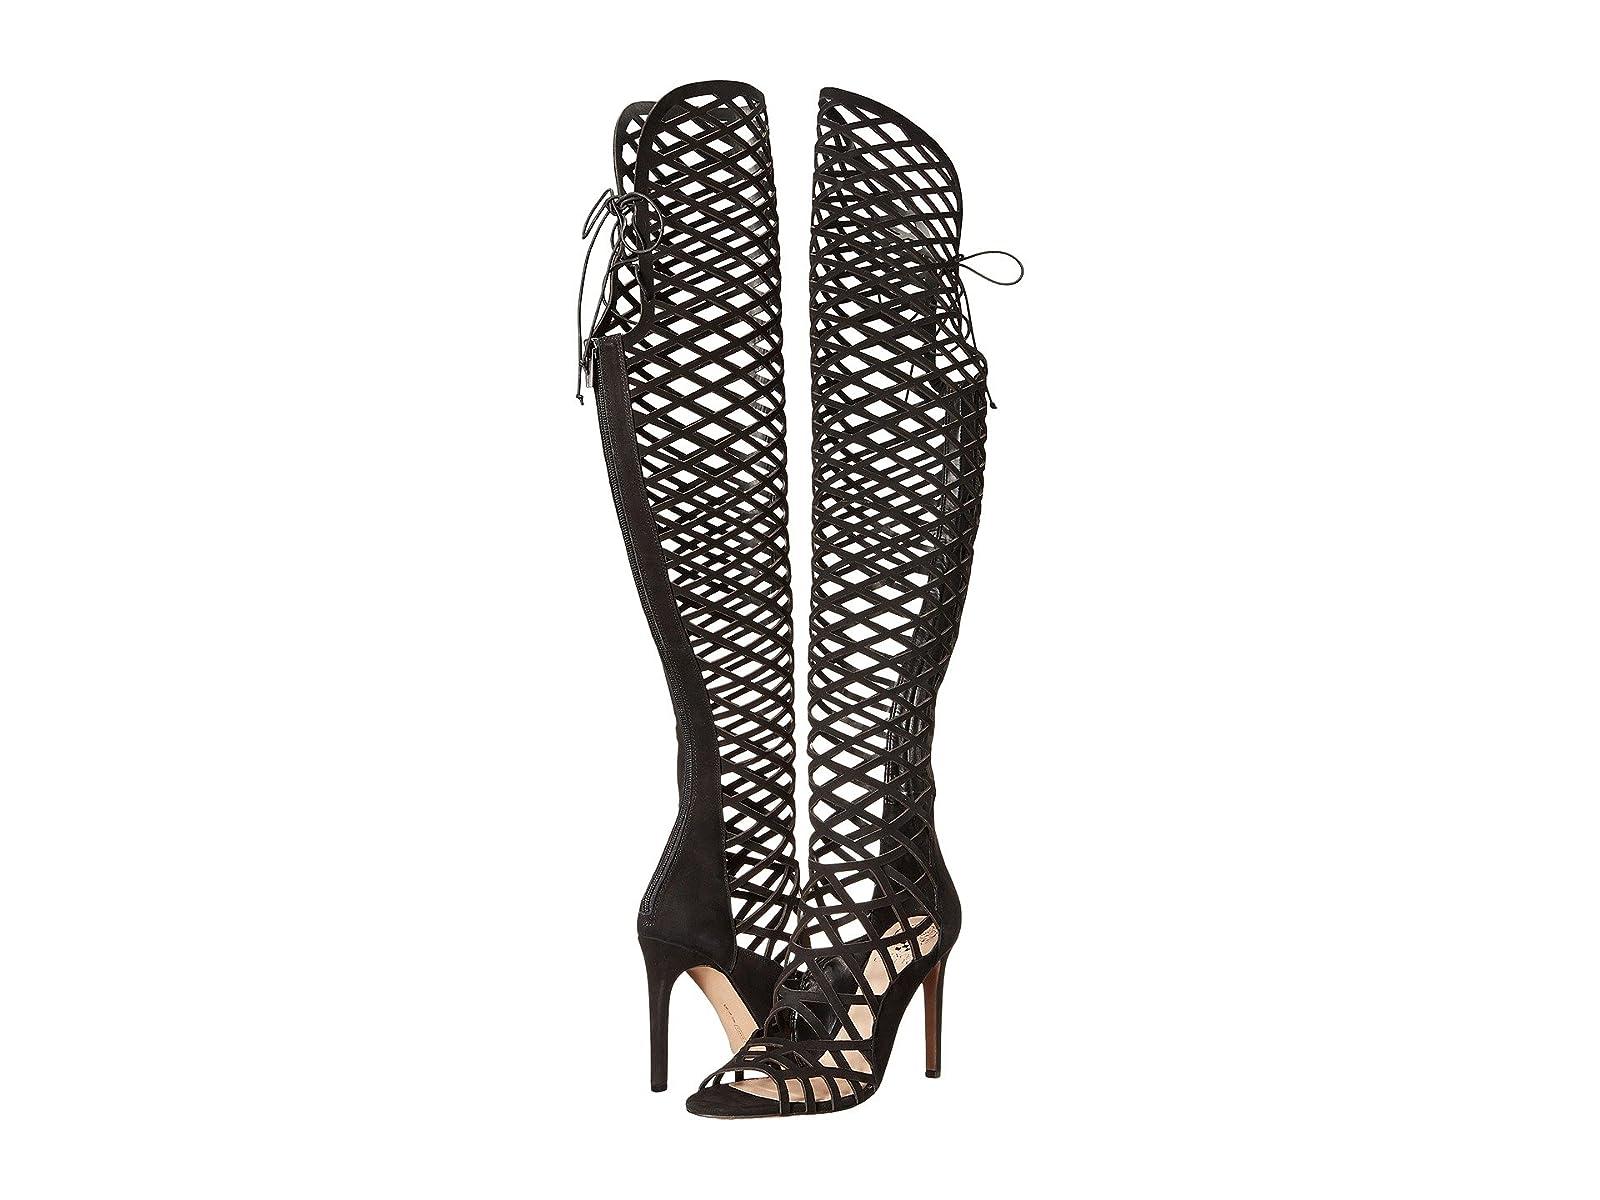 Vince Camuto KelianaCheap and distinctive eye-catching shoes